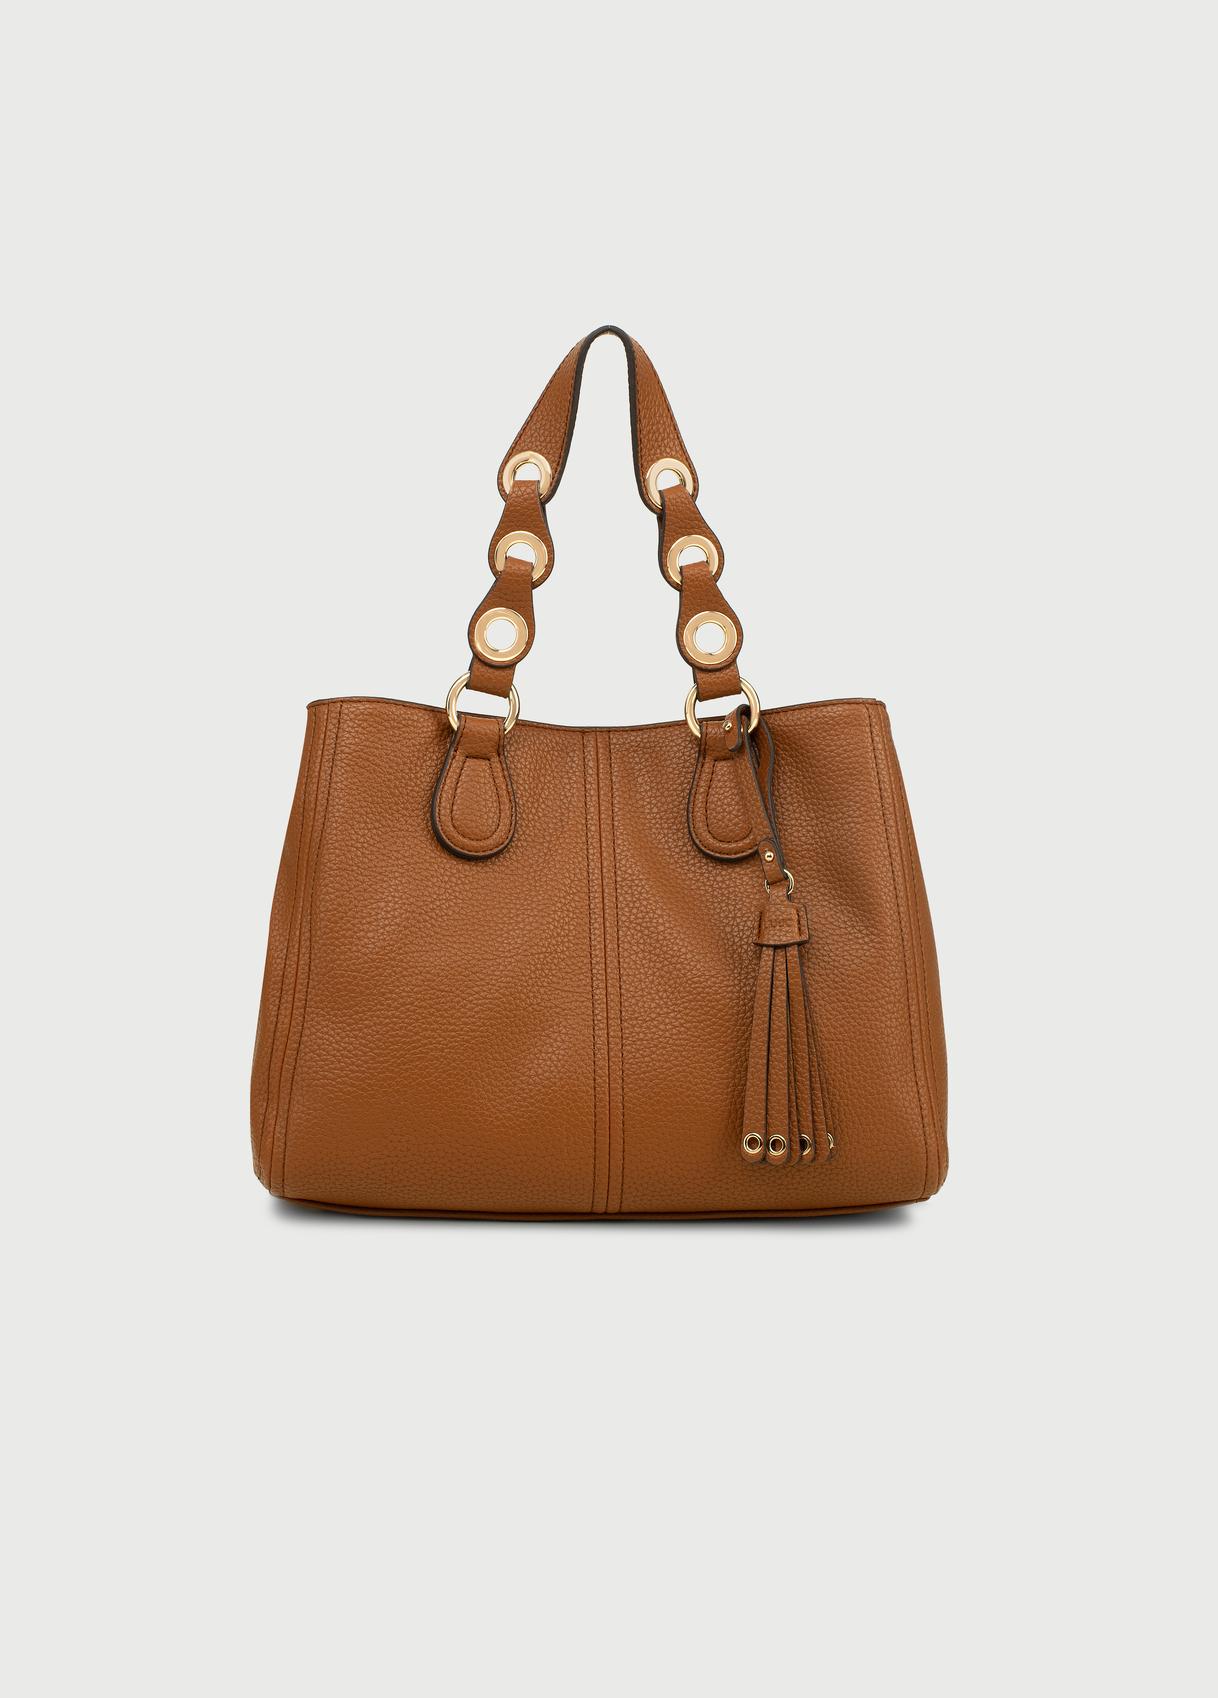 8053473202671-Bags-Handbags-AF0060E0058X0282-S-AF-B-B-01-N